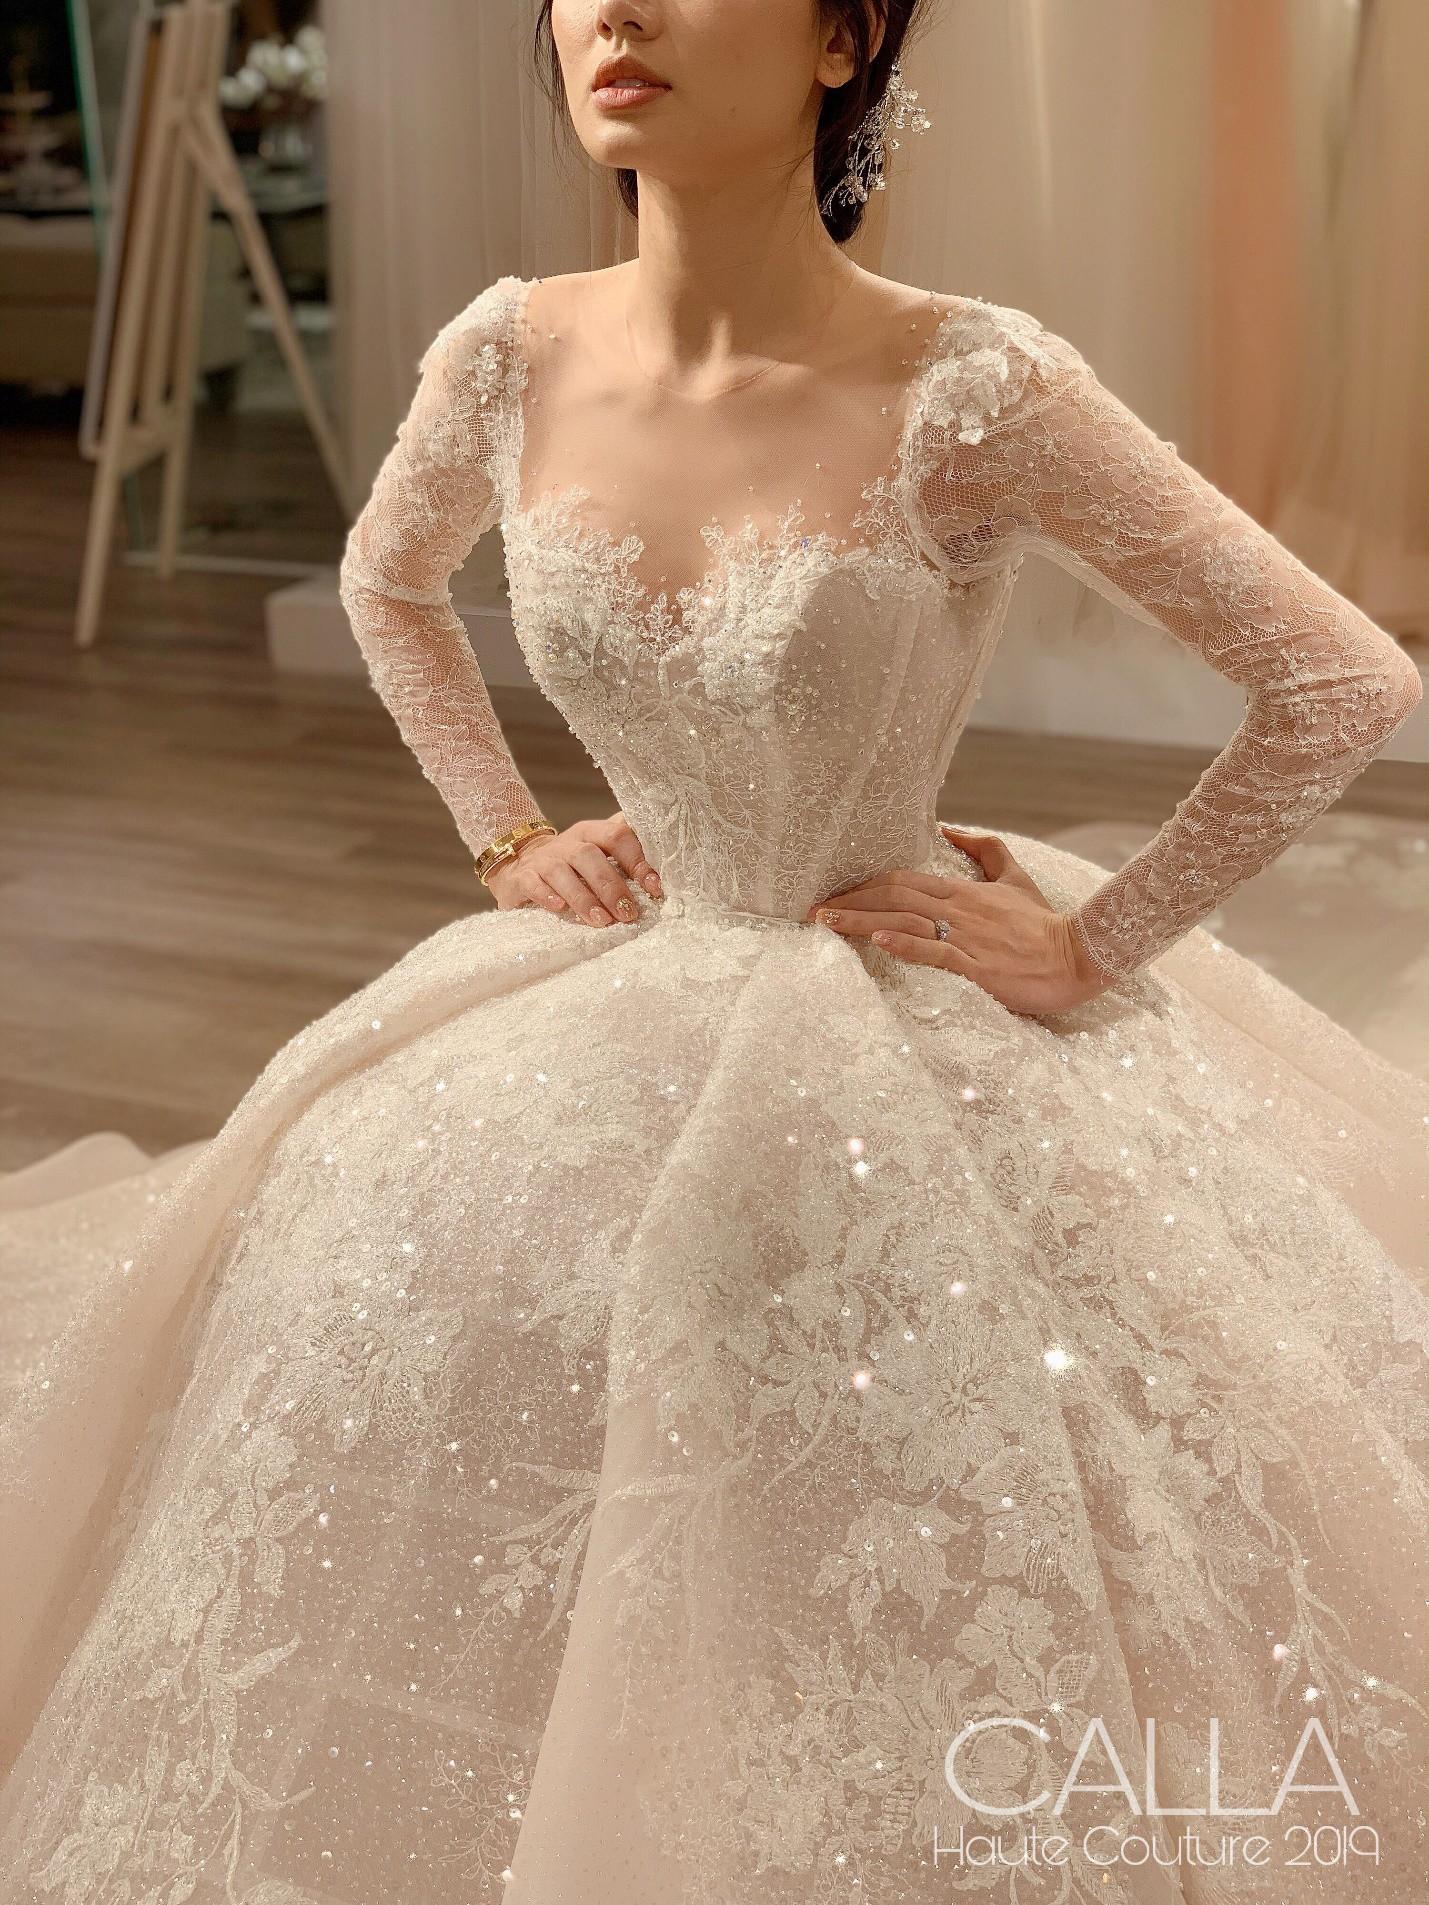 Calla Bridal ra mắt dòng sản phẩm cao cấp Calla Haute Couture 2019 - Ảnh 5.